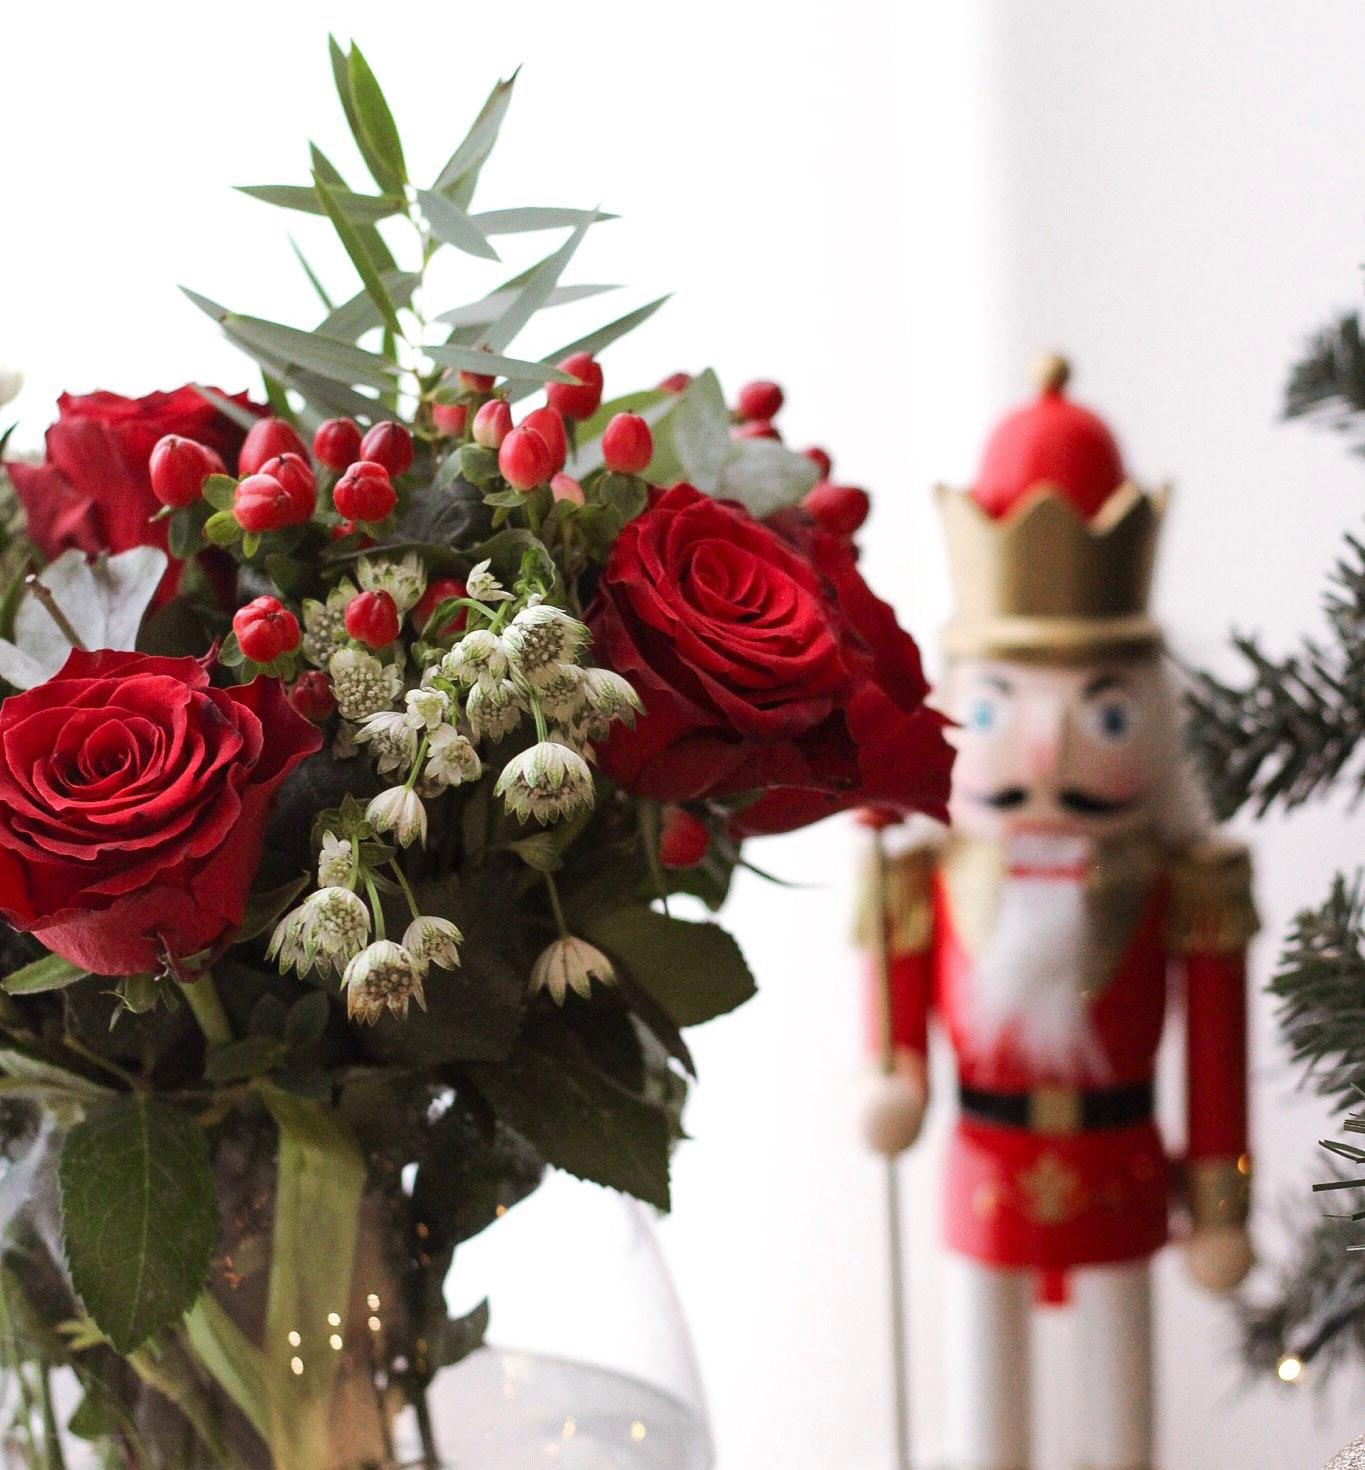 Festive Flower Bouquet